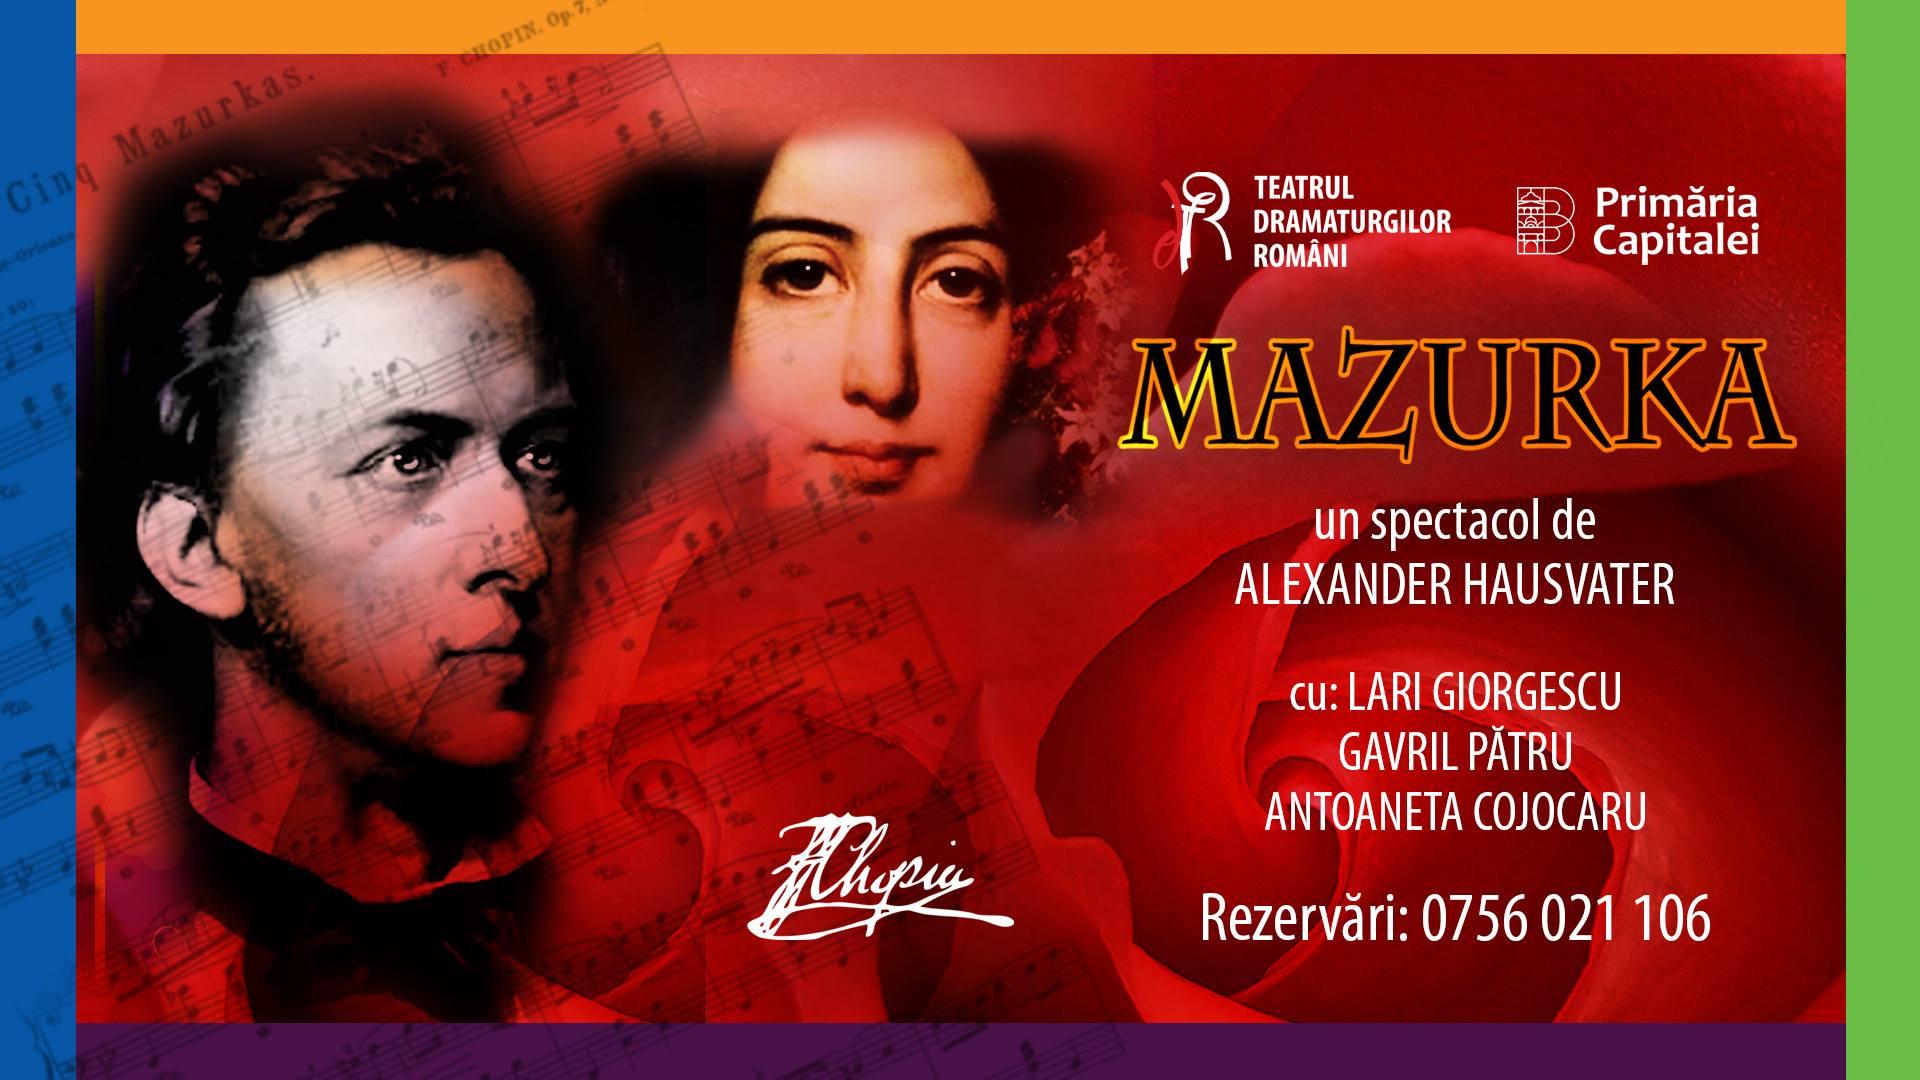 MAZURKA, un spectacol de Alexander Hausvater